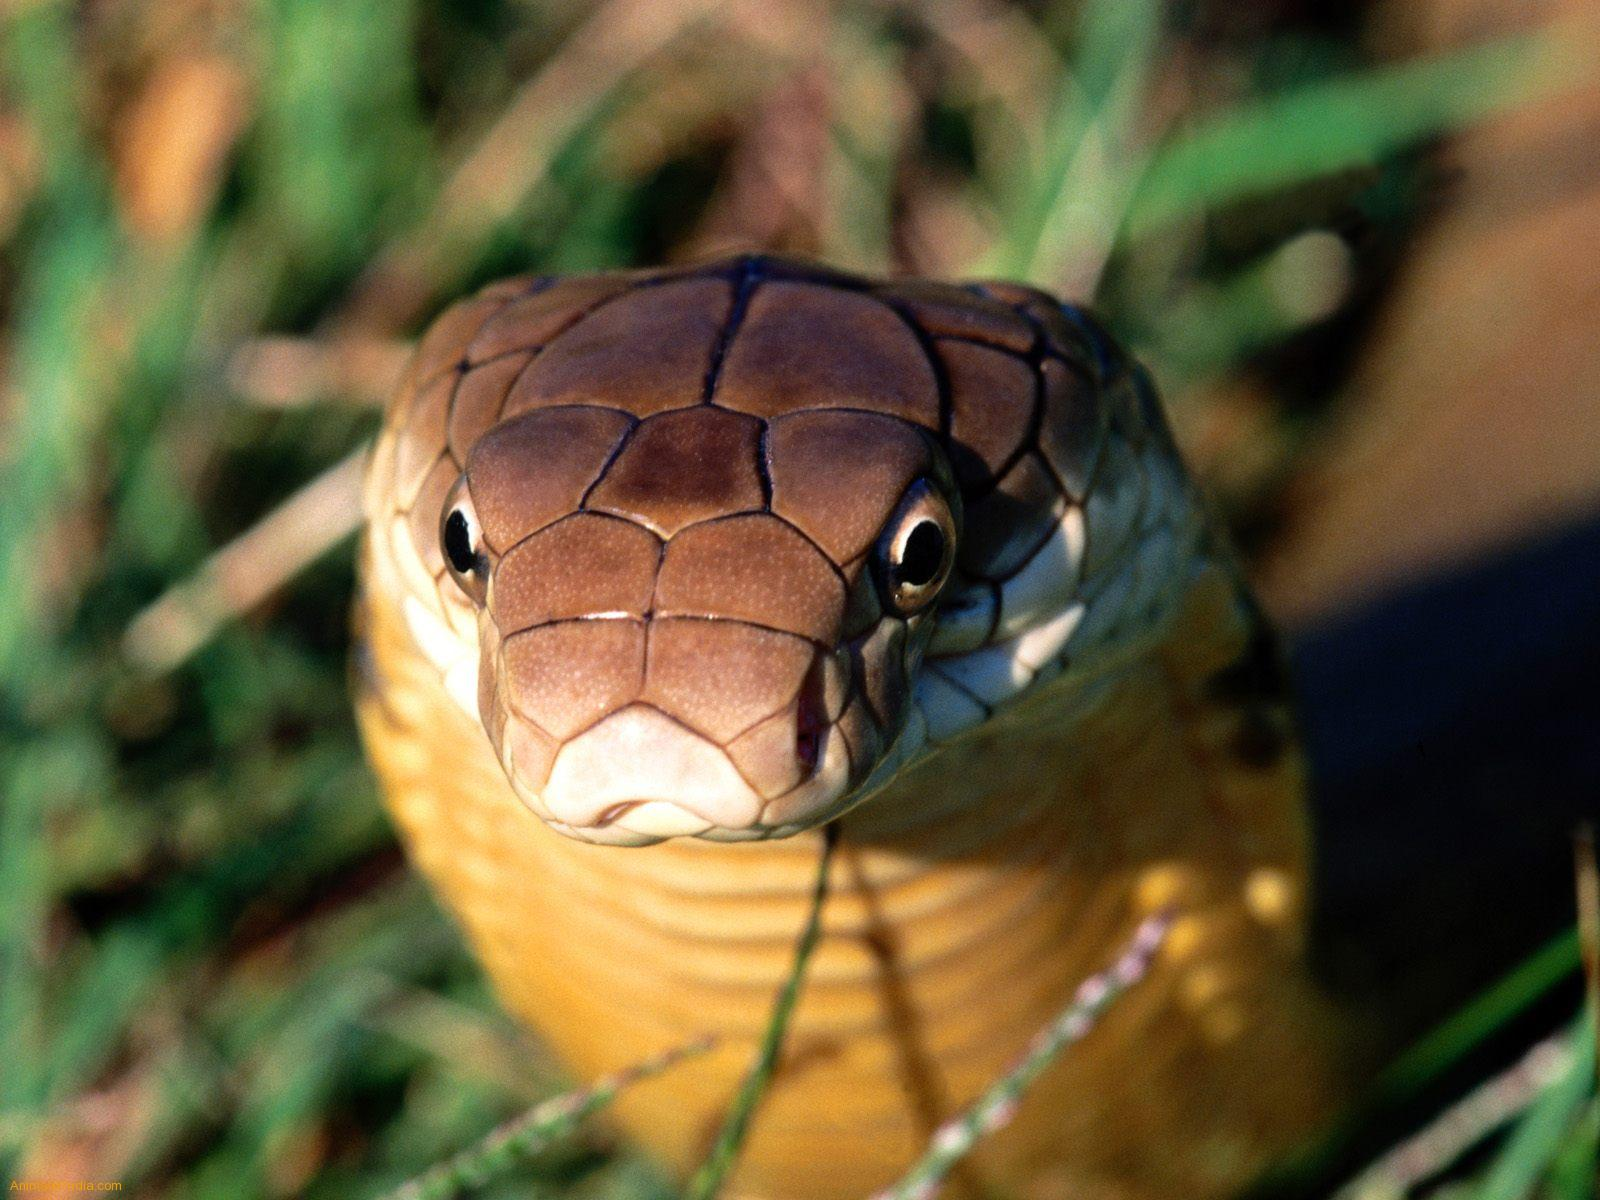 King Cobra Snake Photos: Sumonsenji: King Cobra